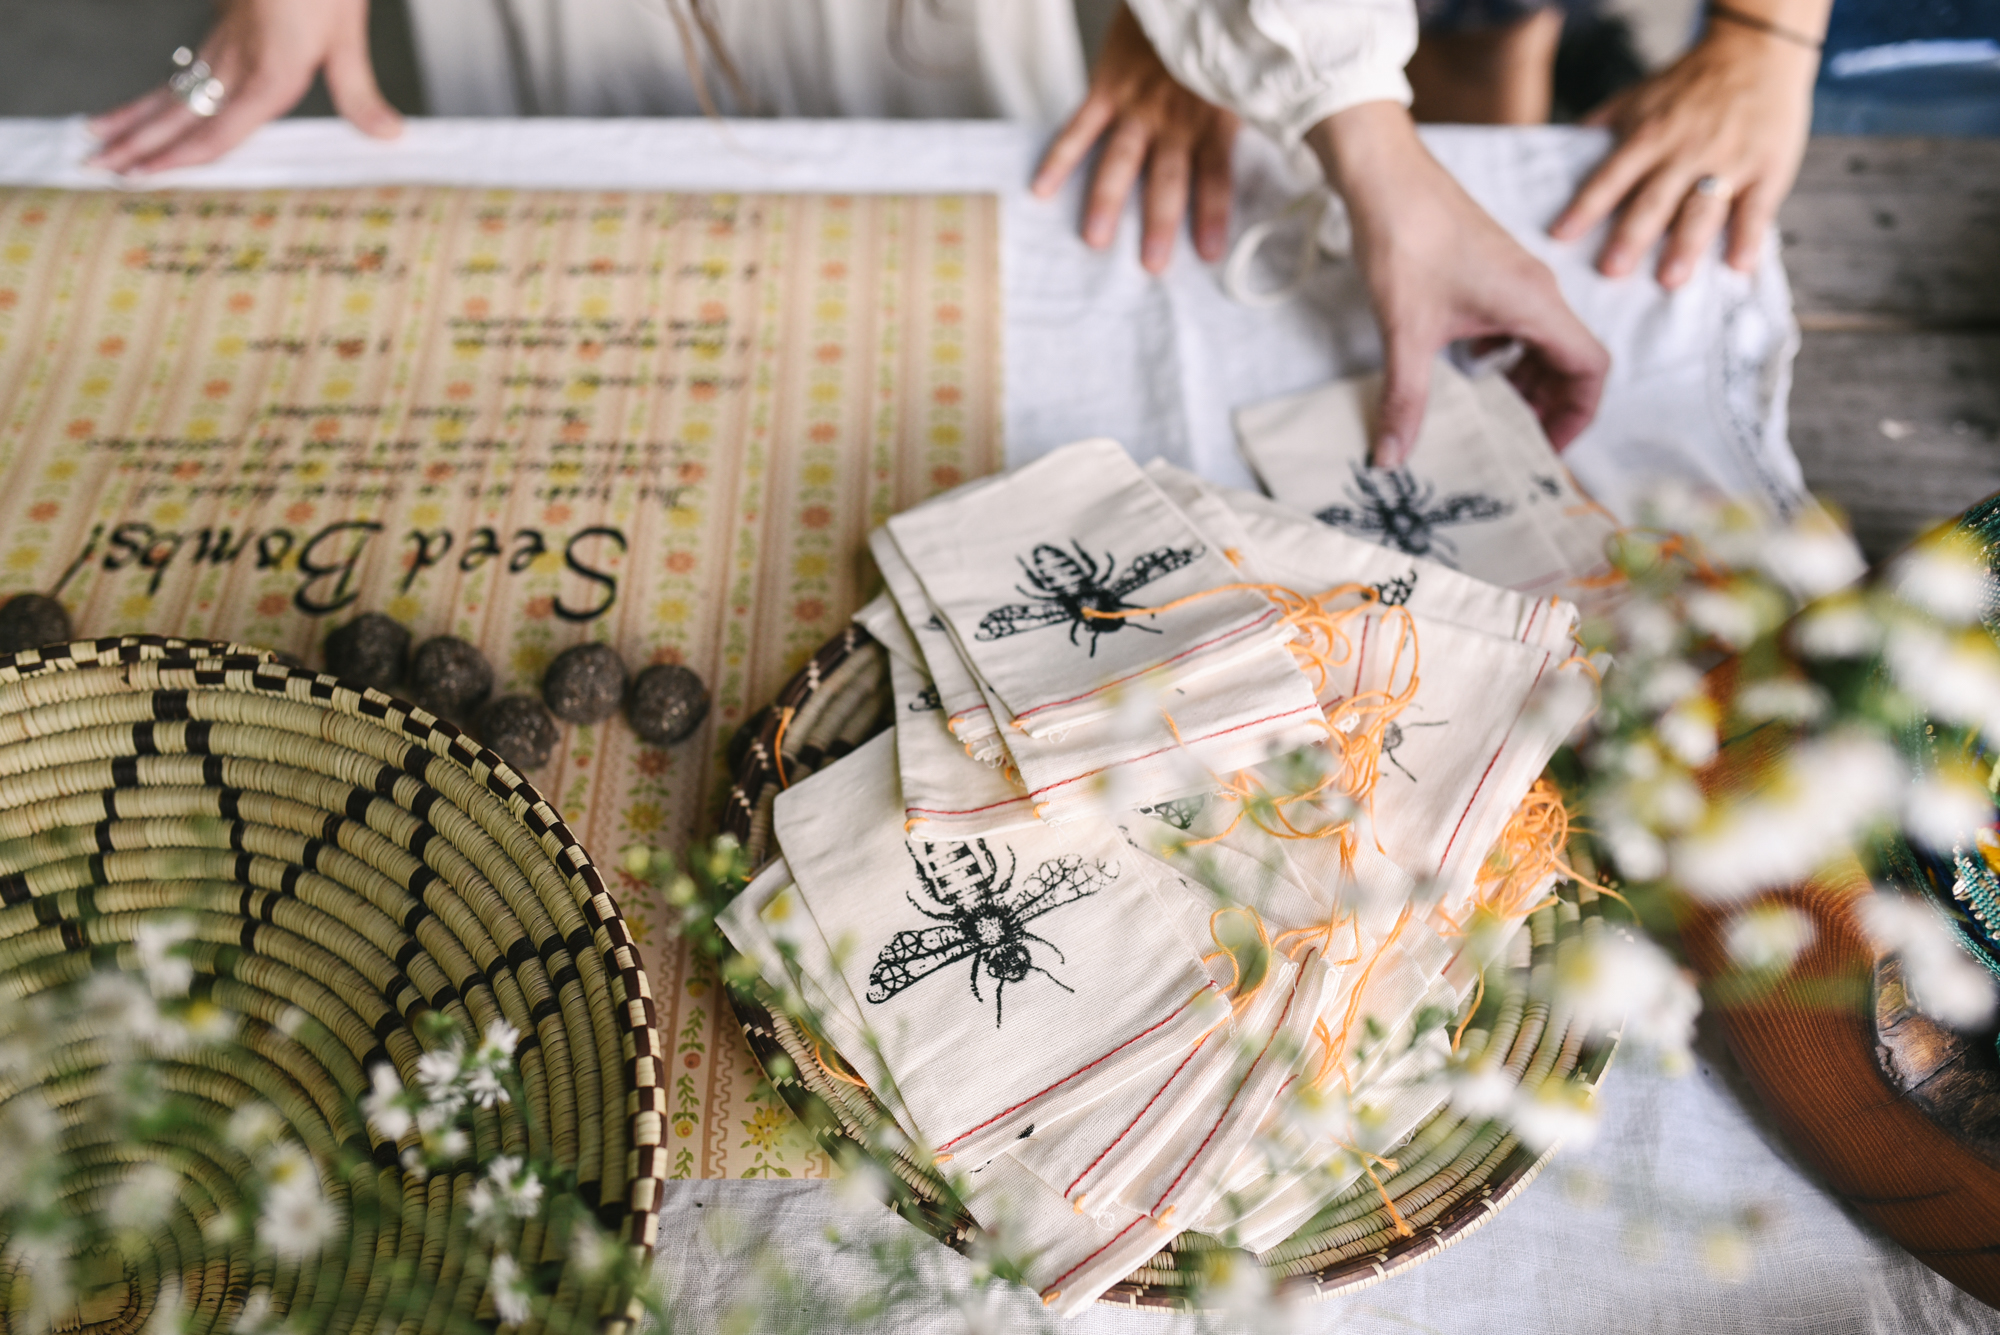 Mountains, Outdoors, Rustic, West Virginia, Maryland Wedding Photographer, DIY, Casual, Seed Bombs, Handmade Wedding Favors